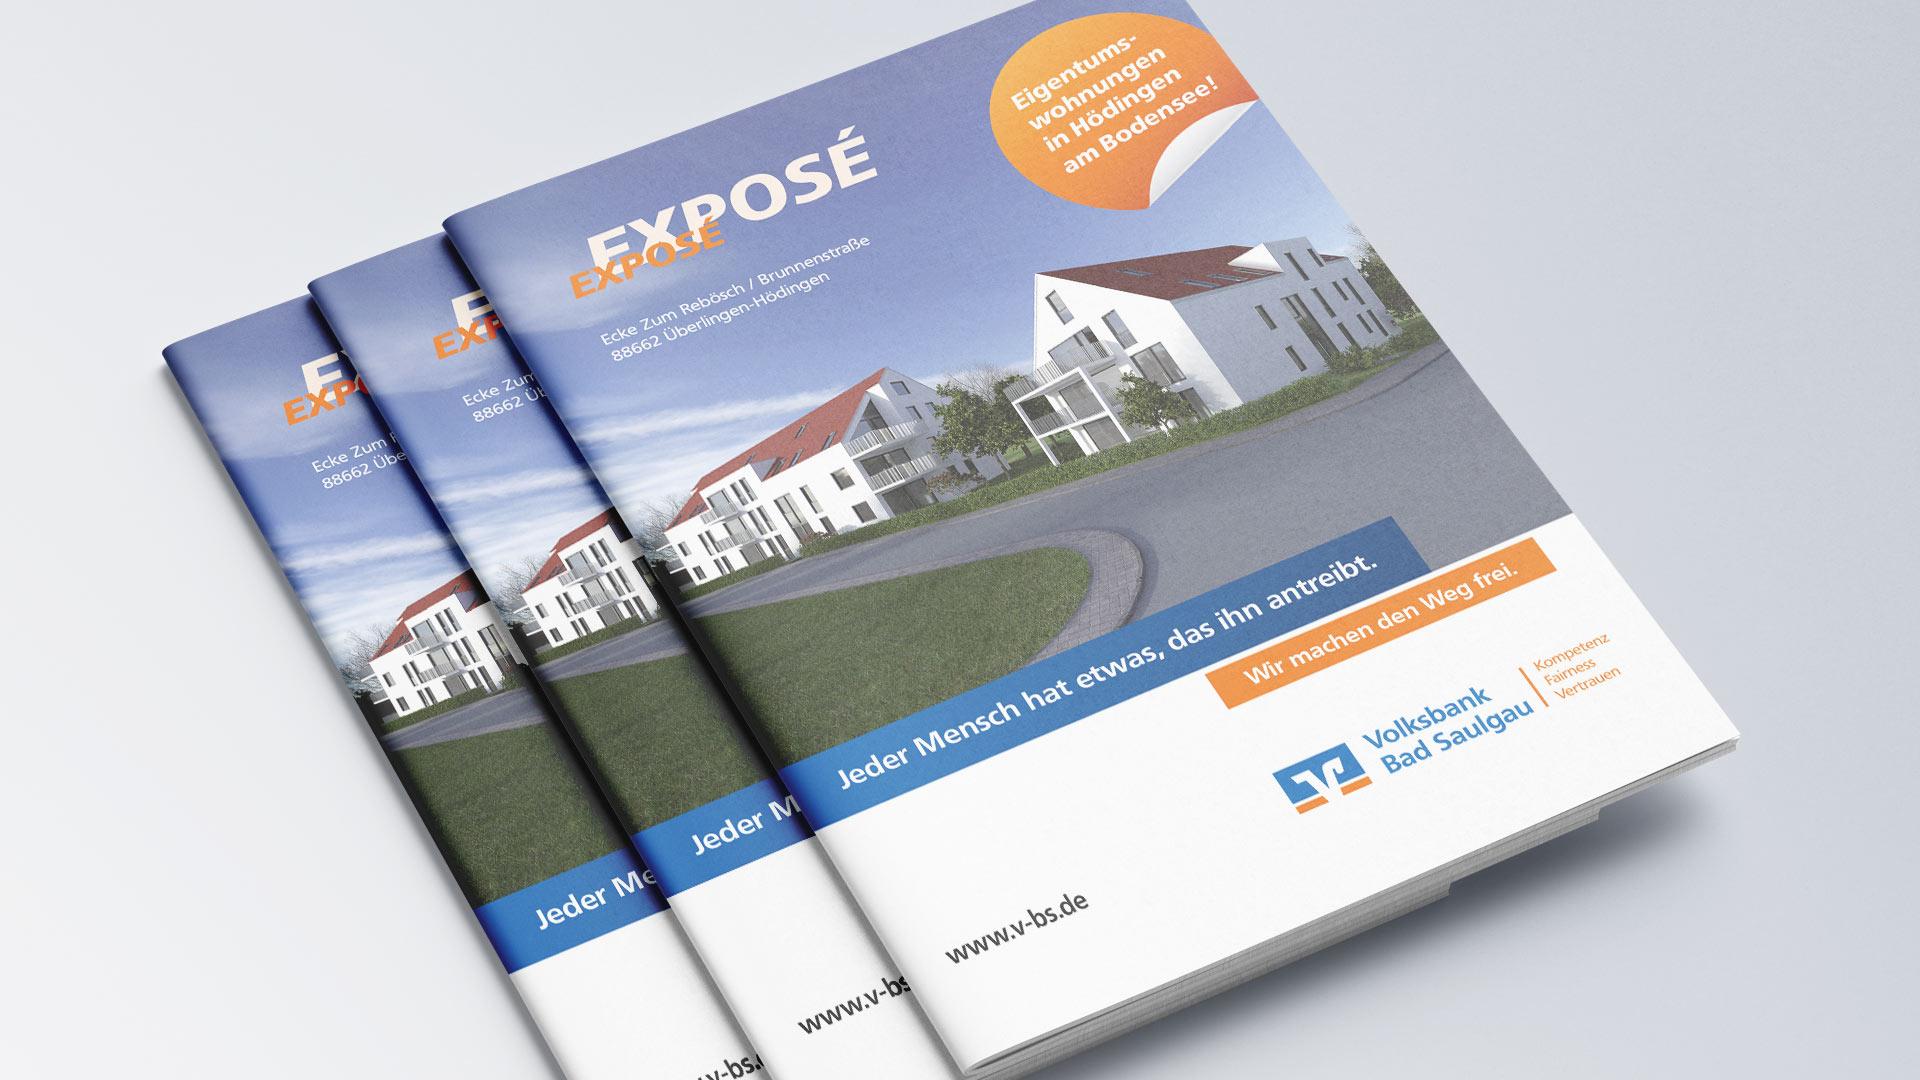 Volksbank Bad Saulgau Exposé Broschüre Immobilien 3D